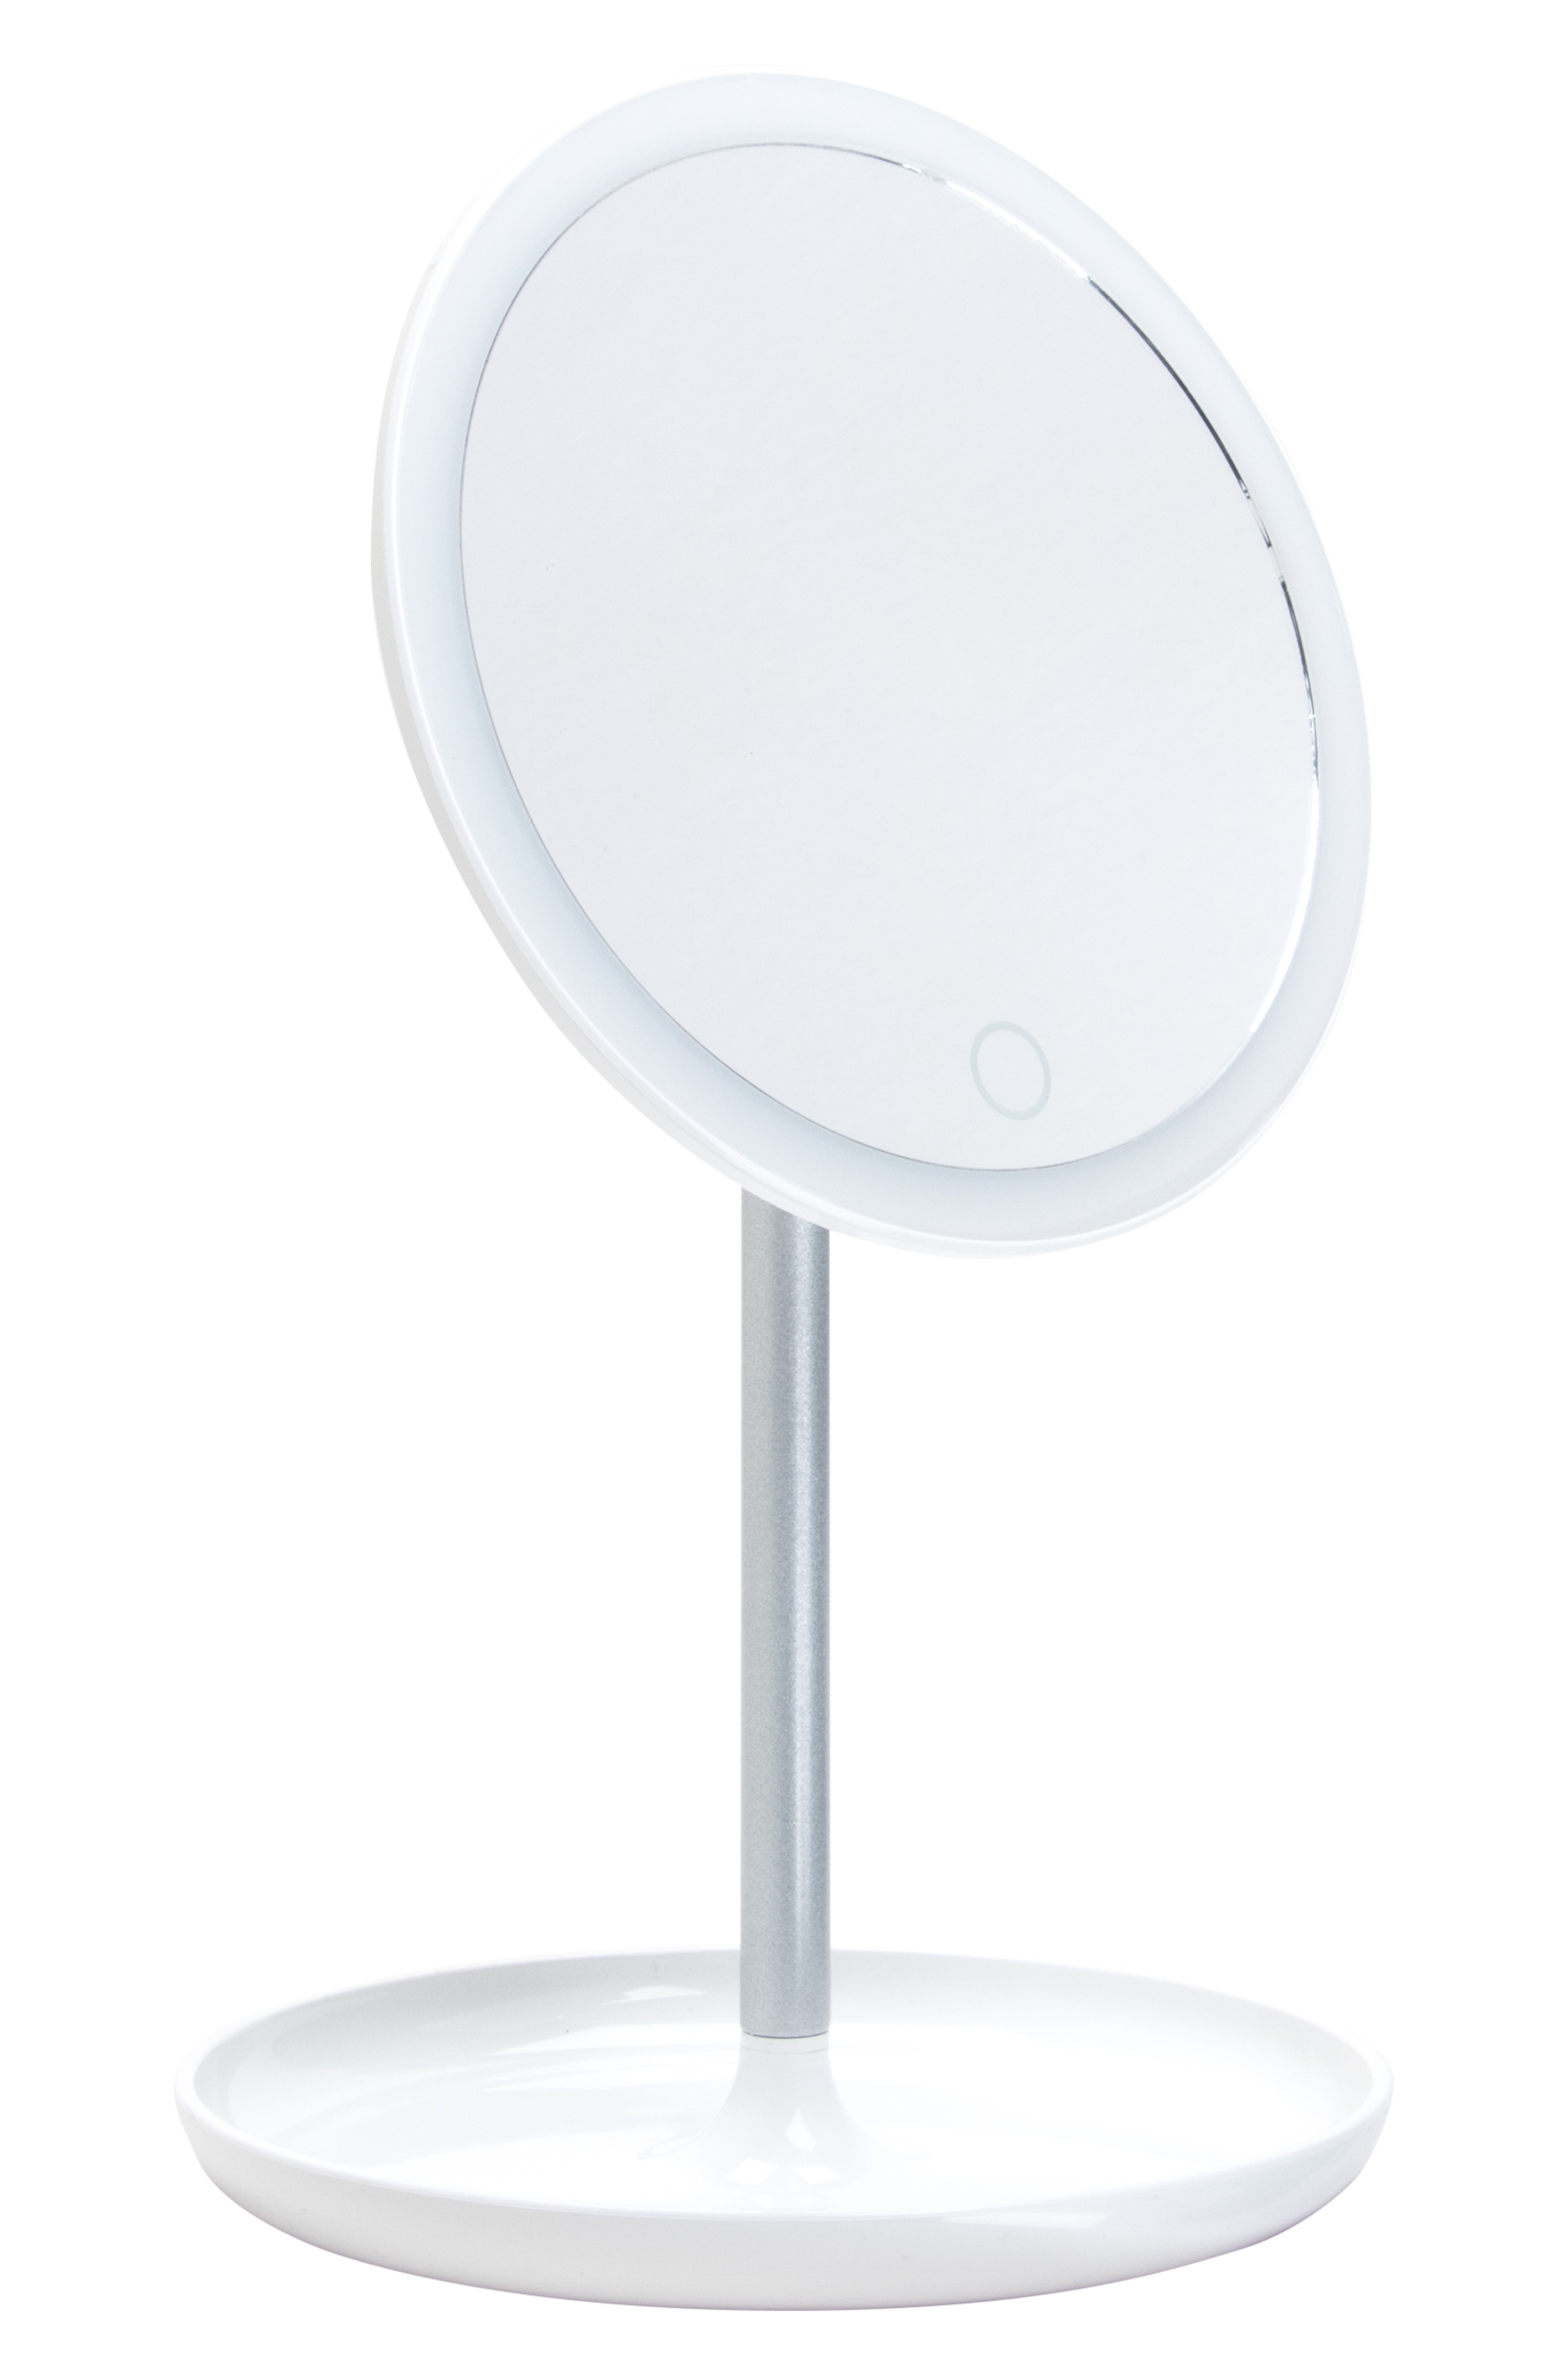 GEZATONE Зеркало косметологическое с подсветкой, на подставке LM207